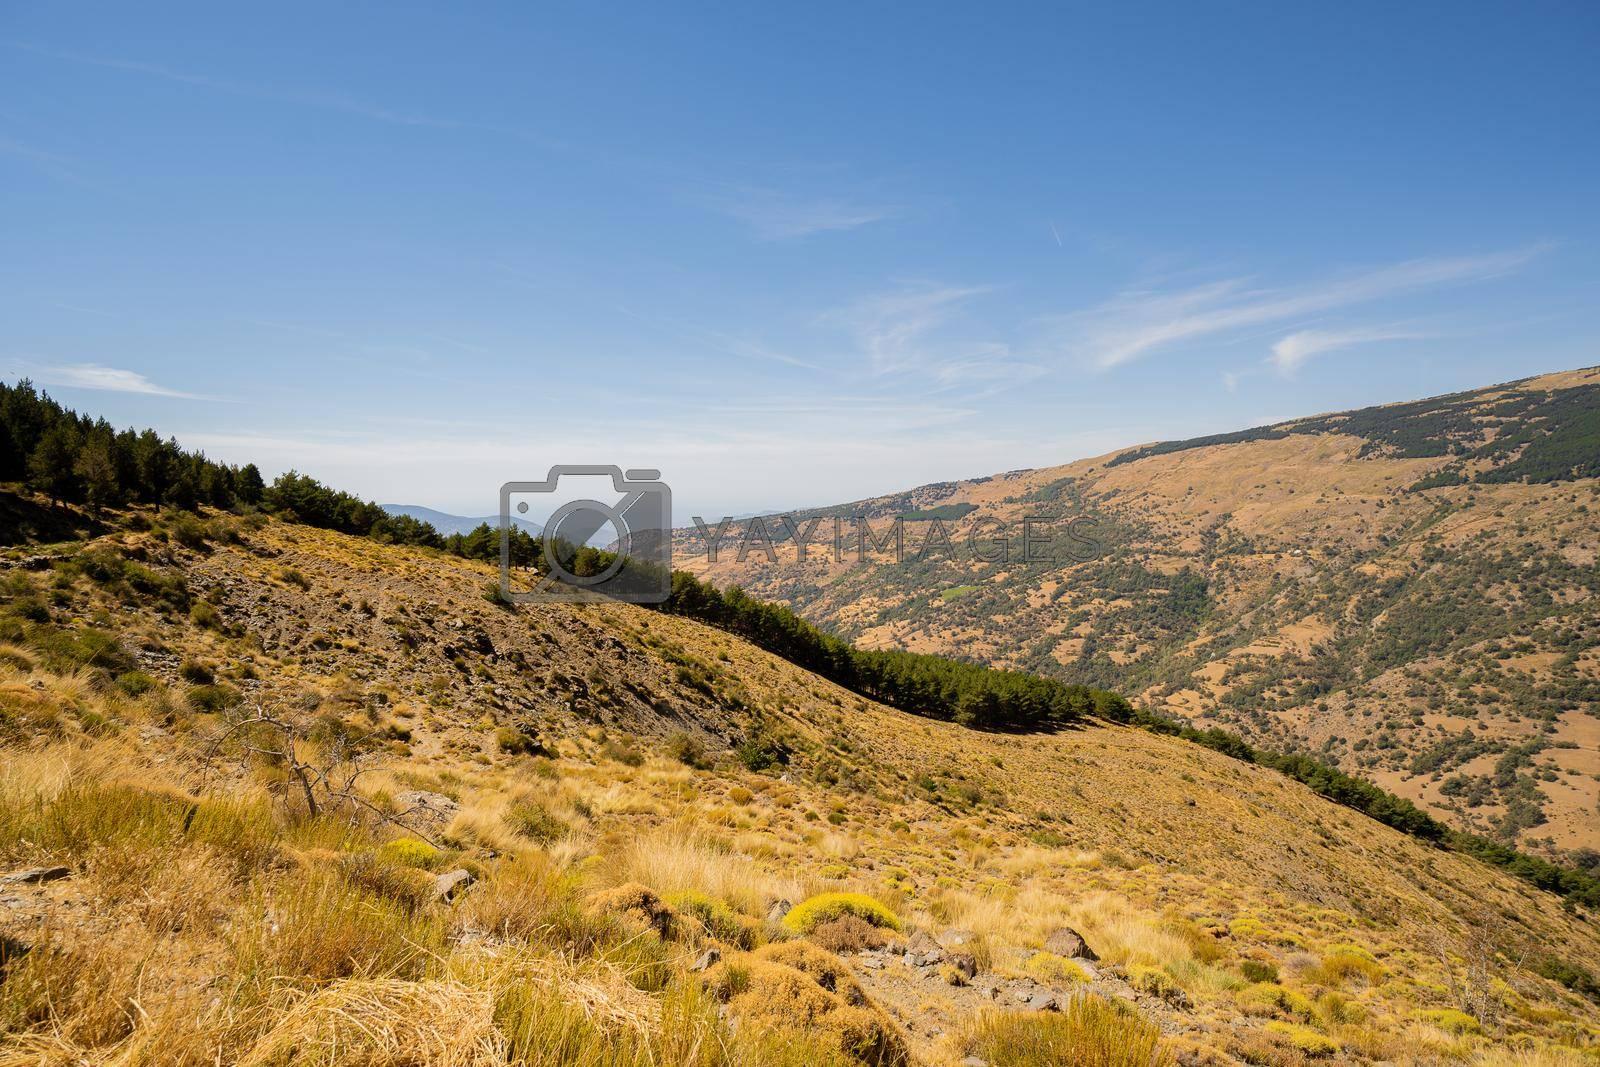 High mountain landscape in summer